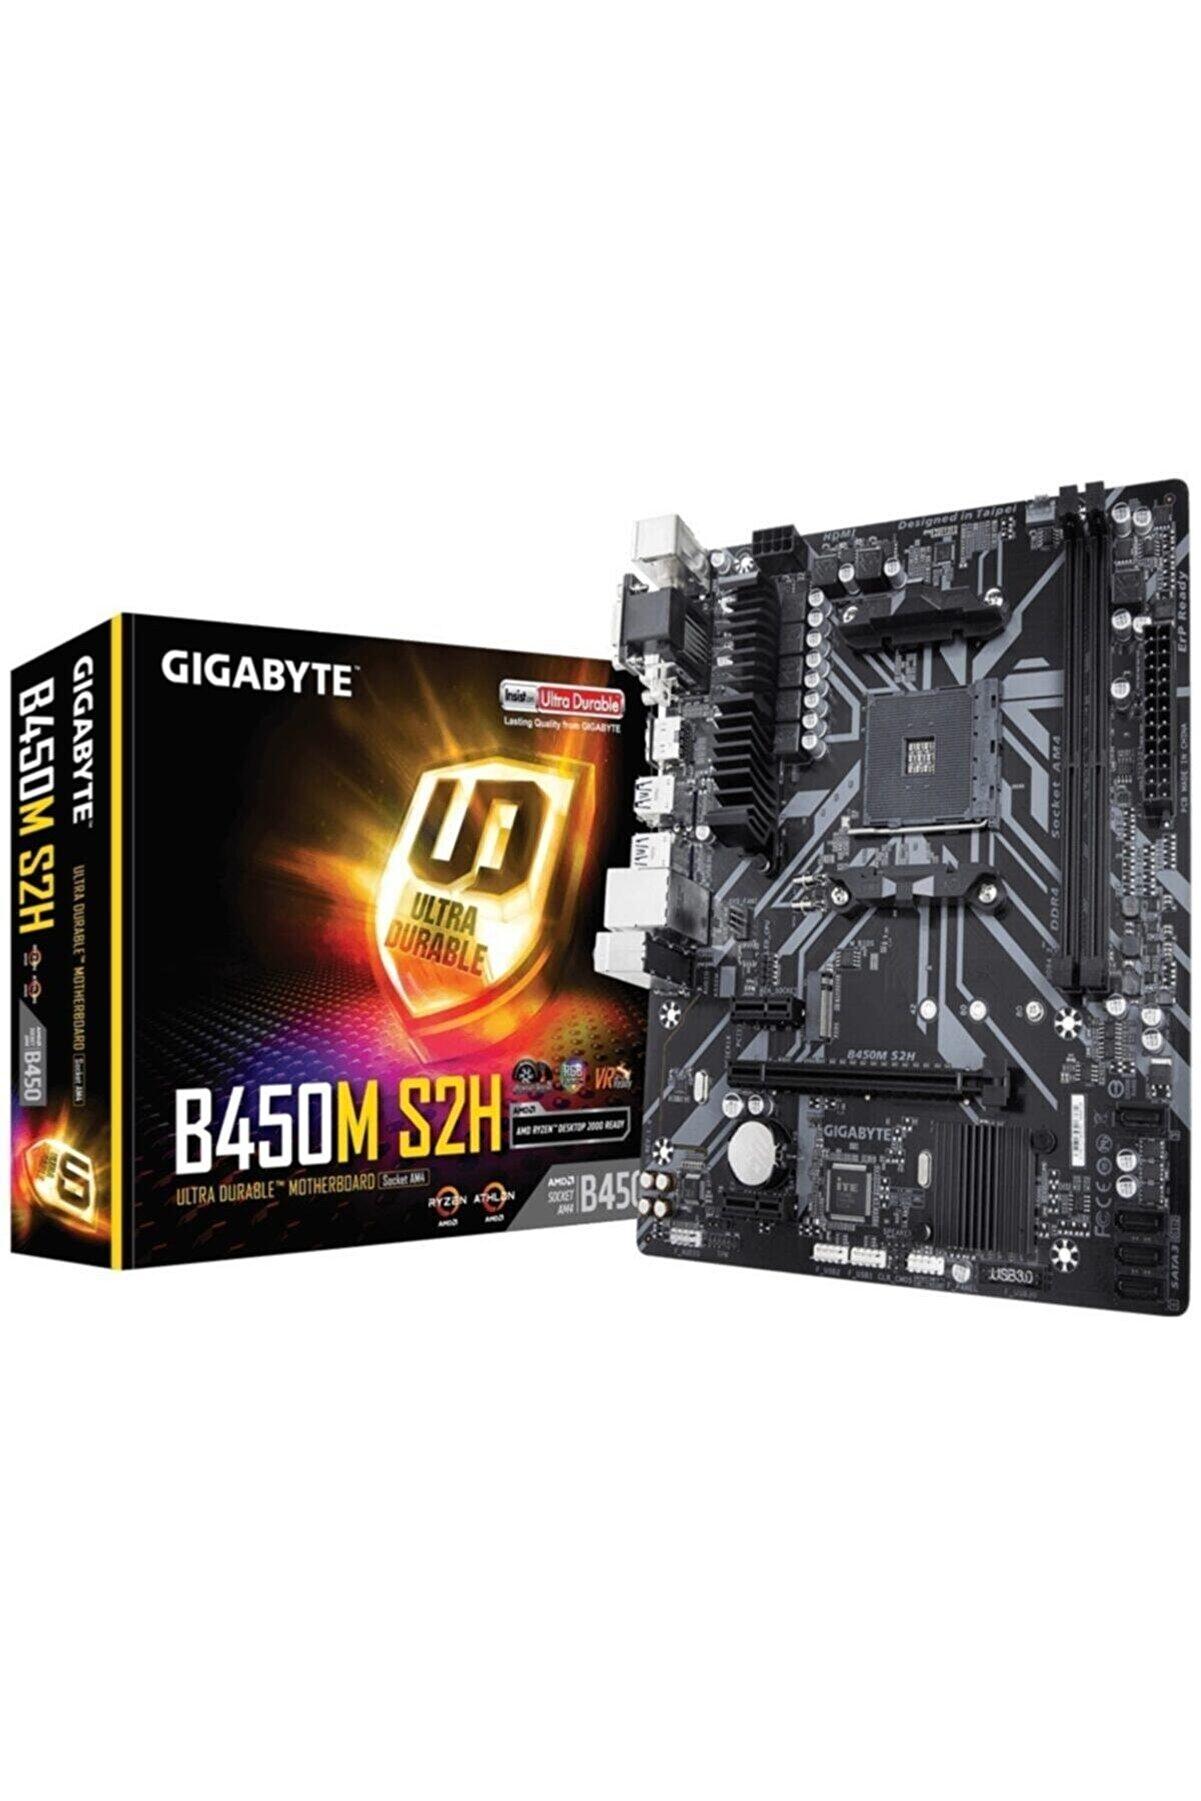 Gigabyte Gıgabyte B450m-s2h Ddr4 M2 Pcıe Nvme Hdmı Dvı Pcıe 16x V3.0 Am4 Matx